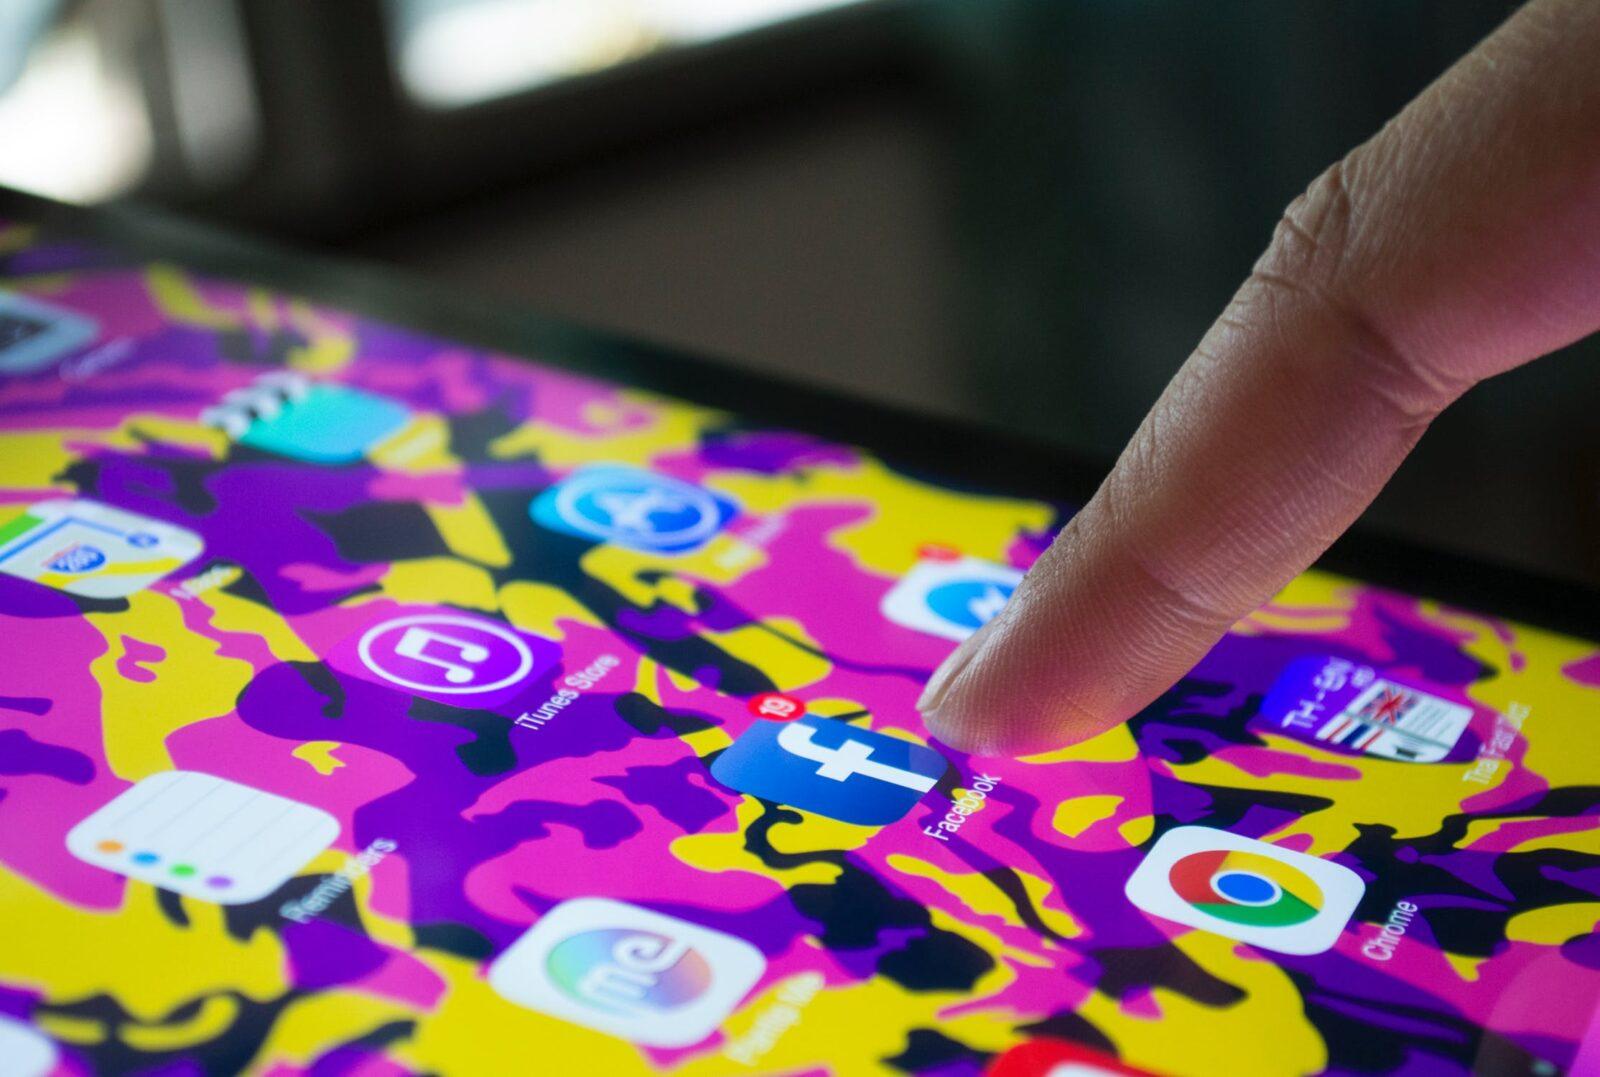 Facebook ที่กำลังจะพาโลกไปสู่ Messaging  Network และ Timeline กำลังจะหายไป ?